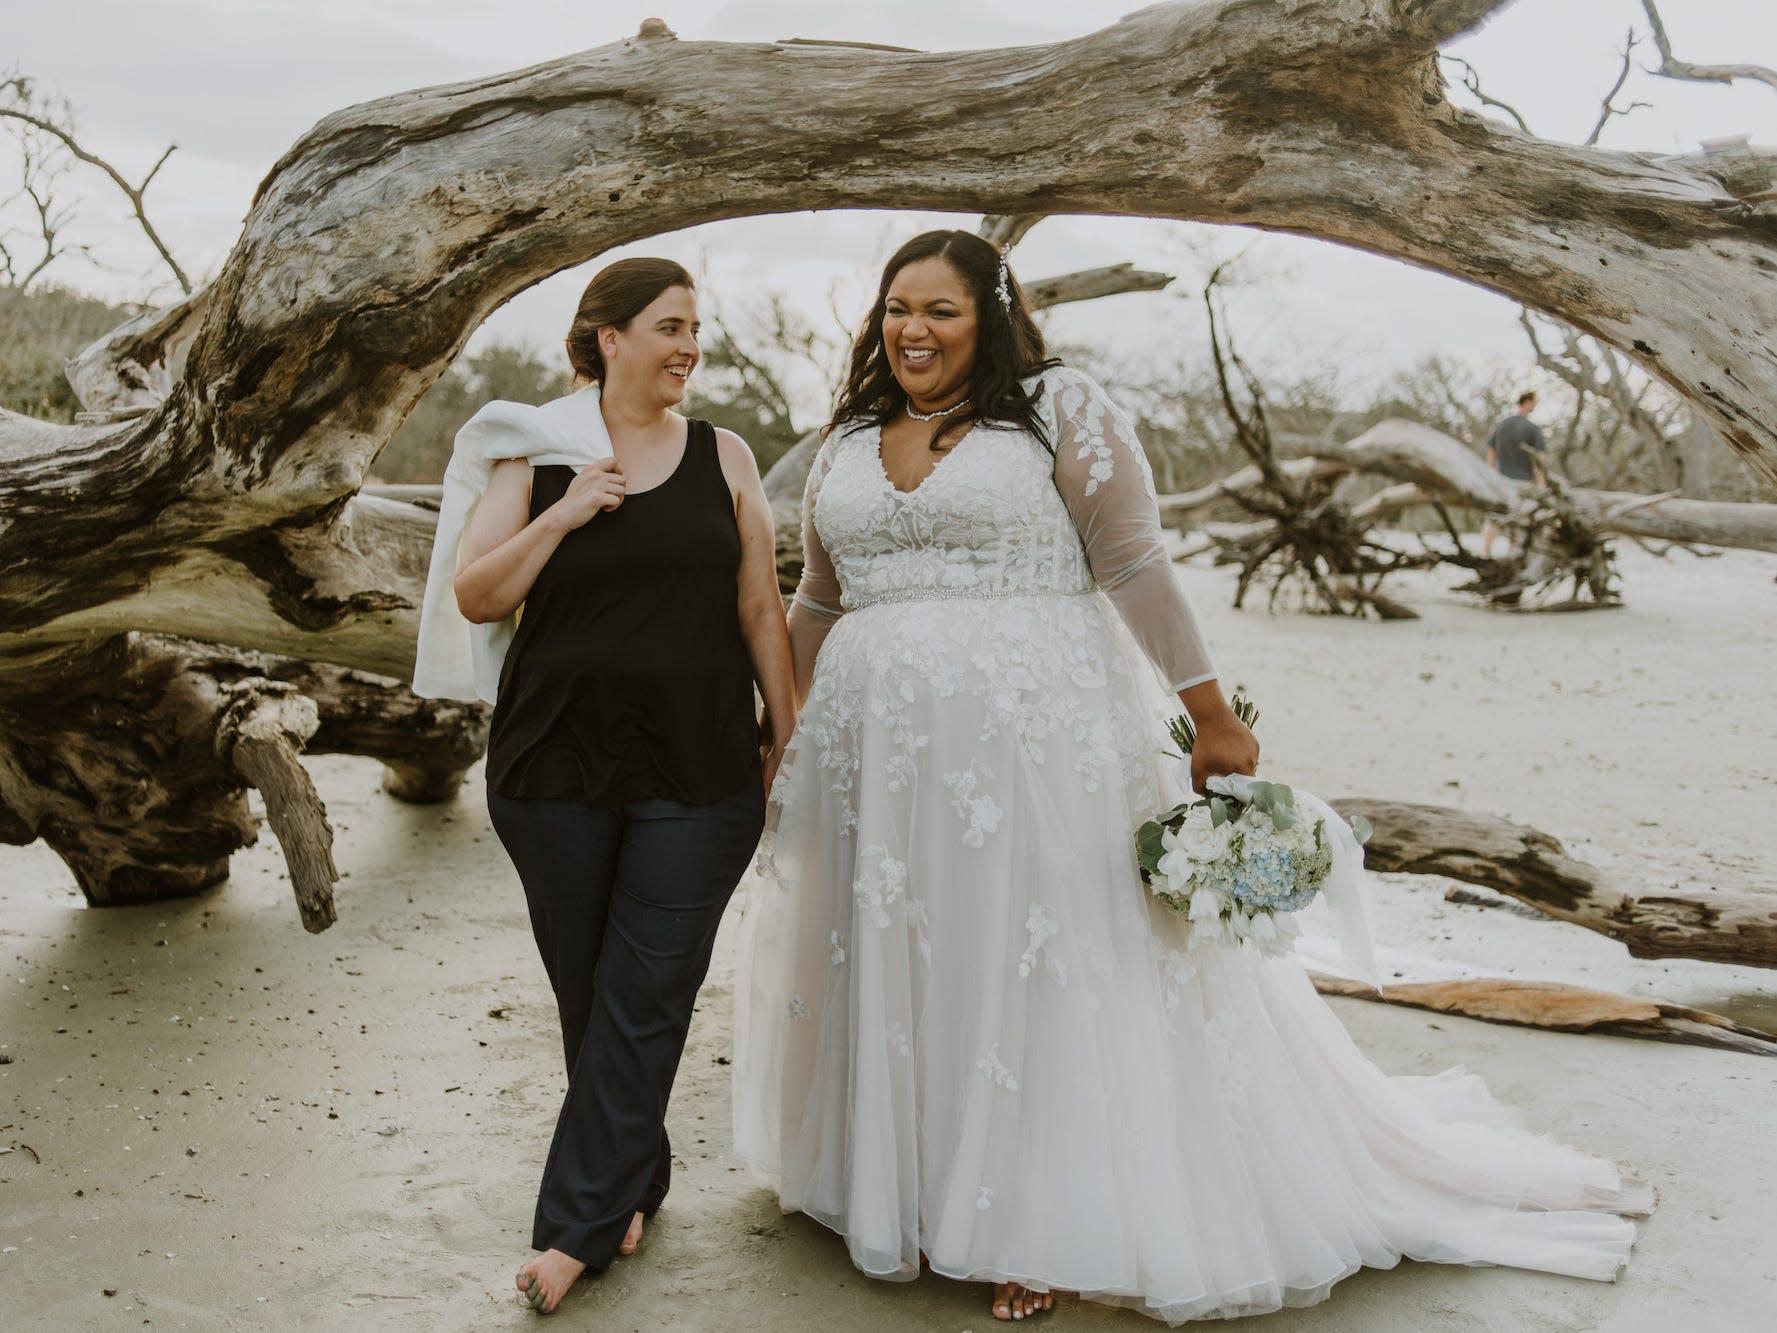 sierraandkatie.elopement.beach.jekyllisland.photographer.stsimons.photography 3657